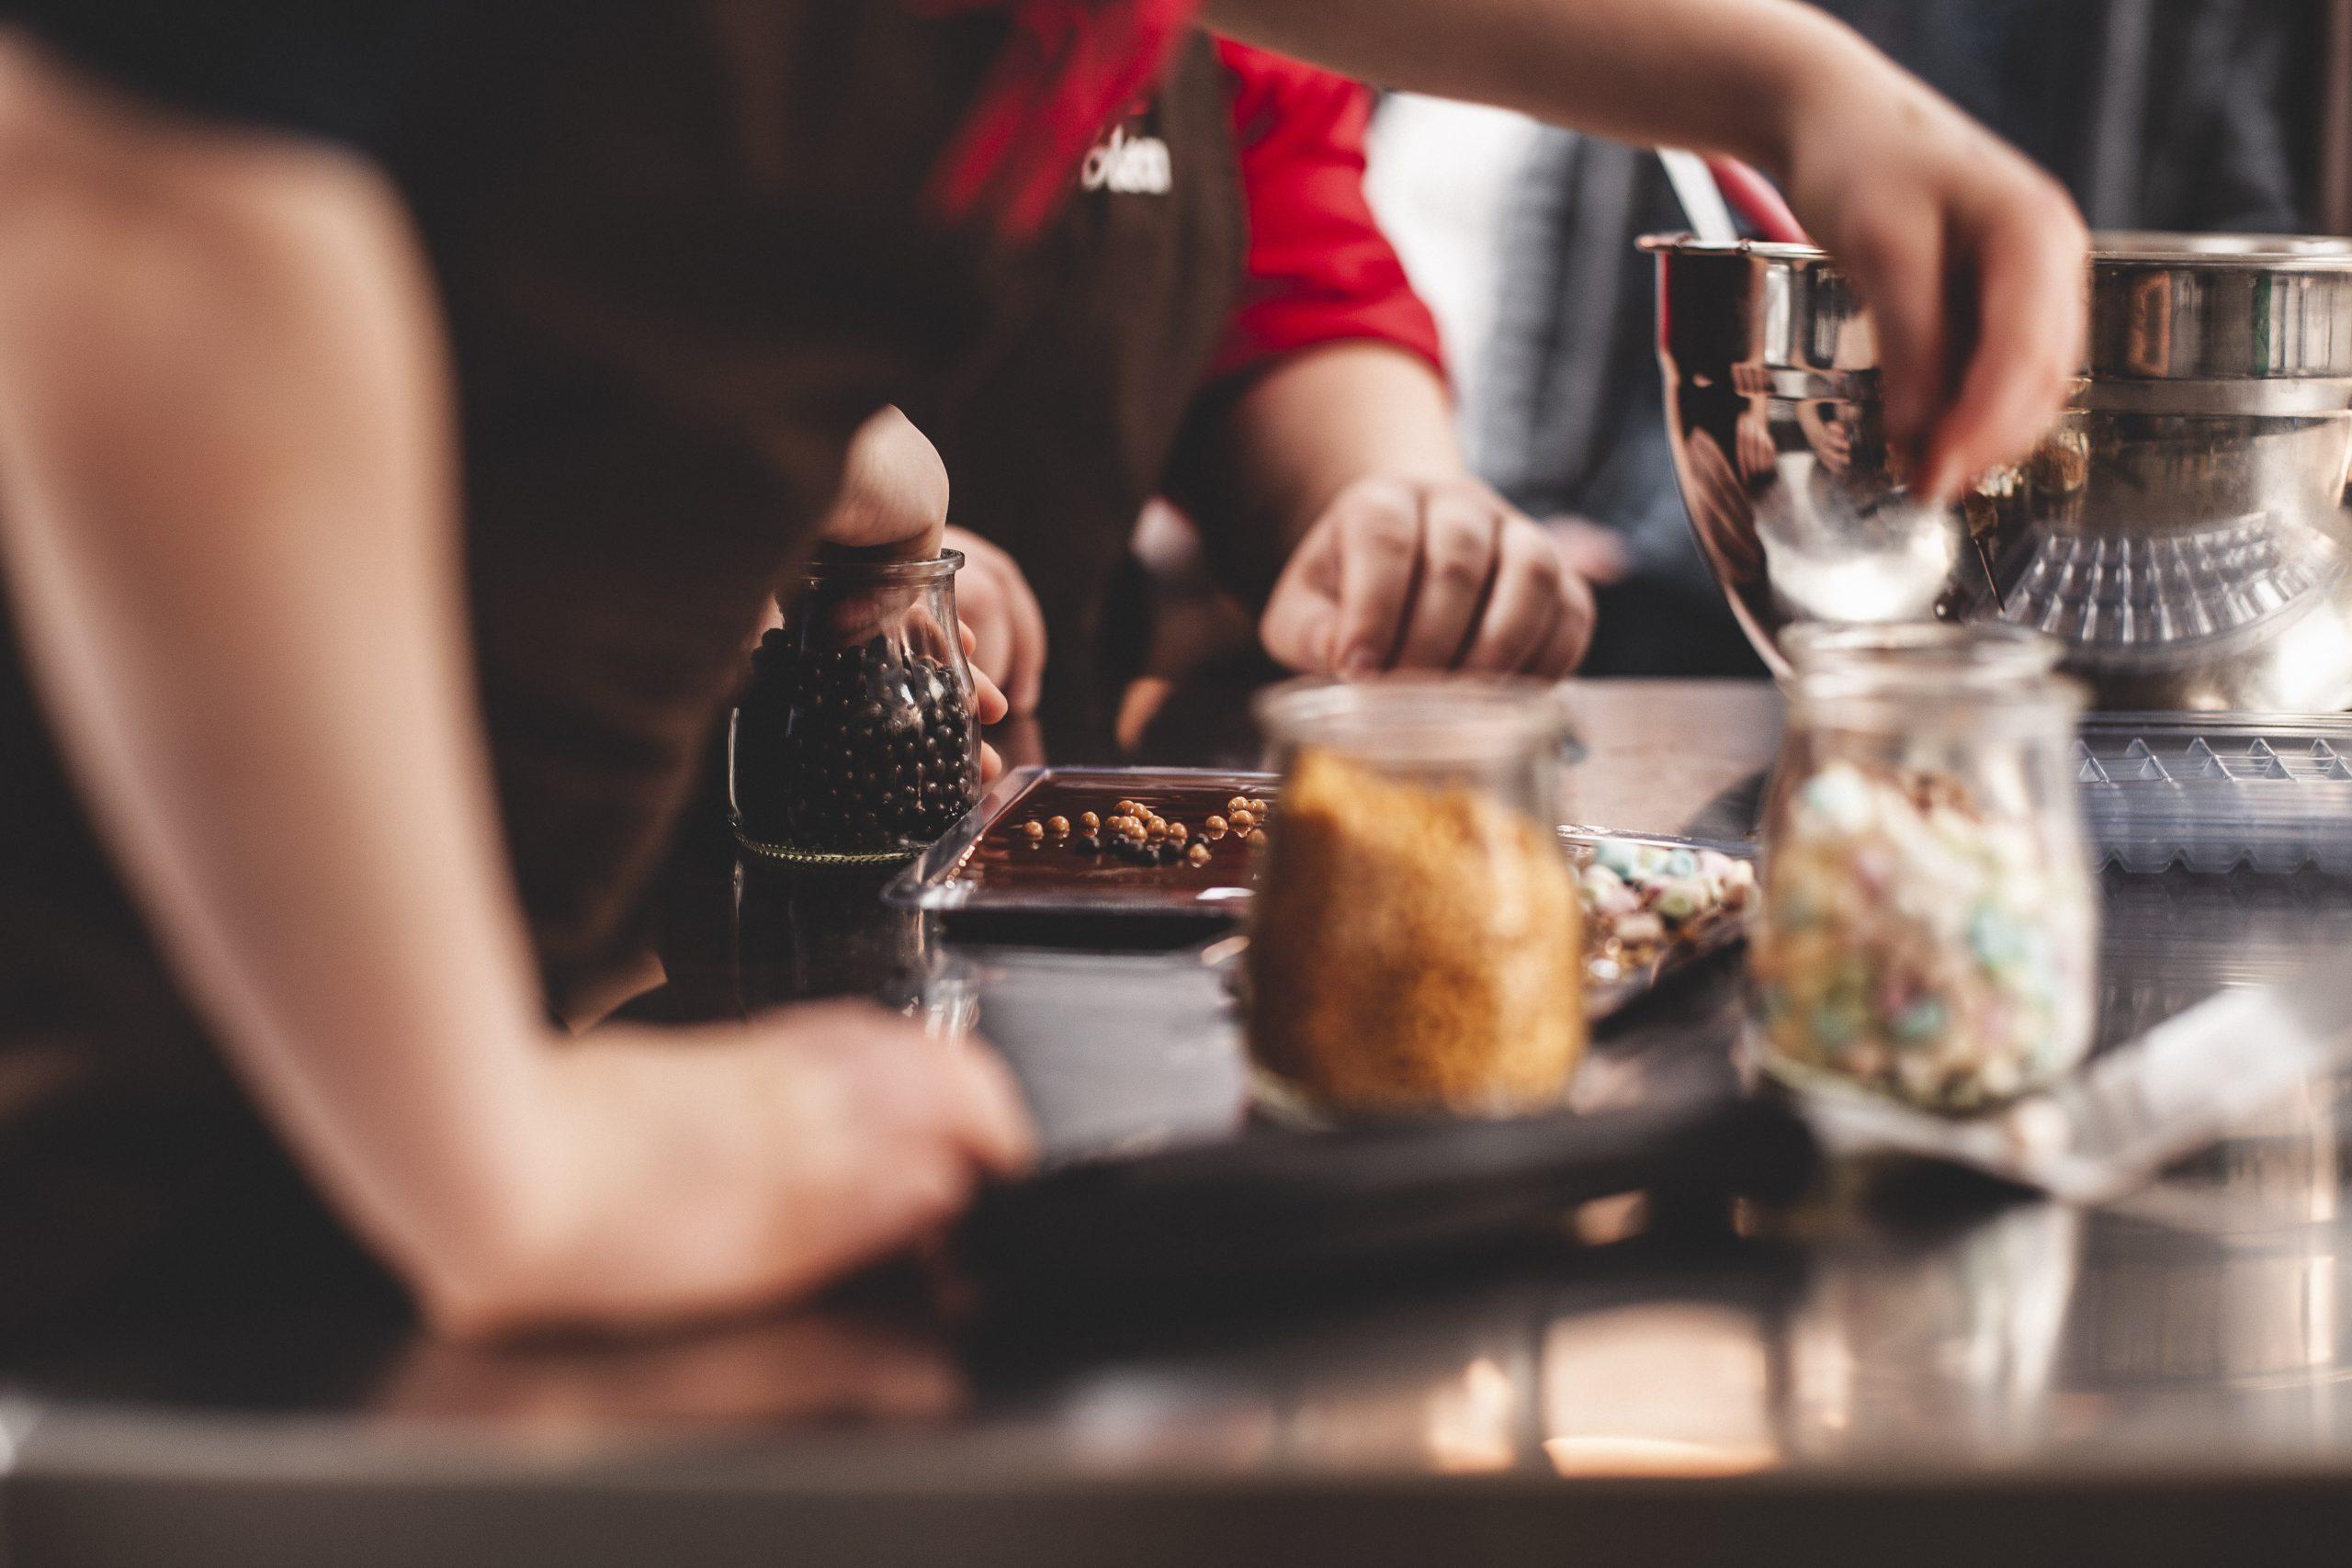 xocolea-schhokoladenmanufaktur-olpe-sauerland_MG_4595